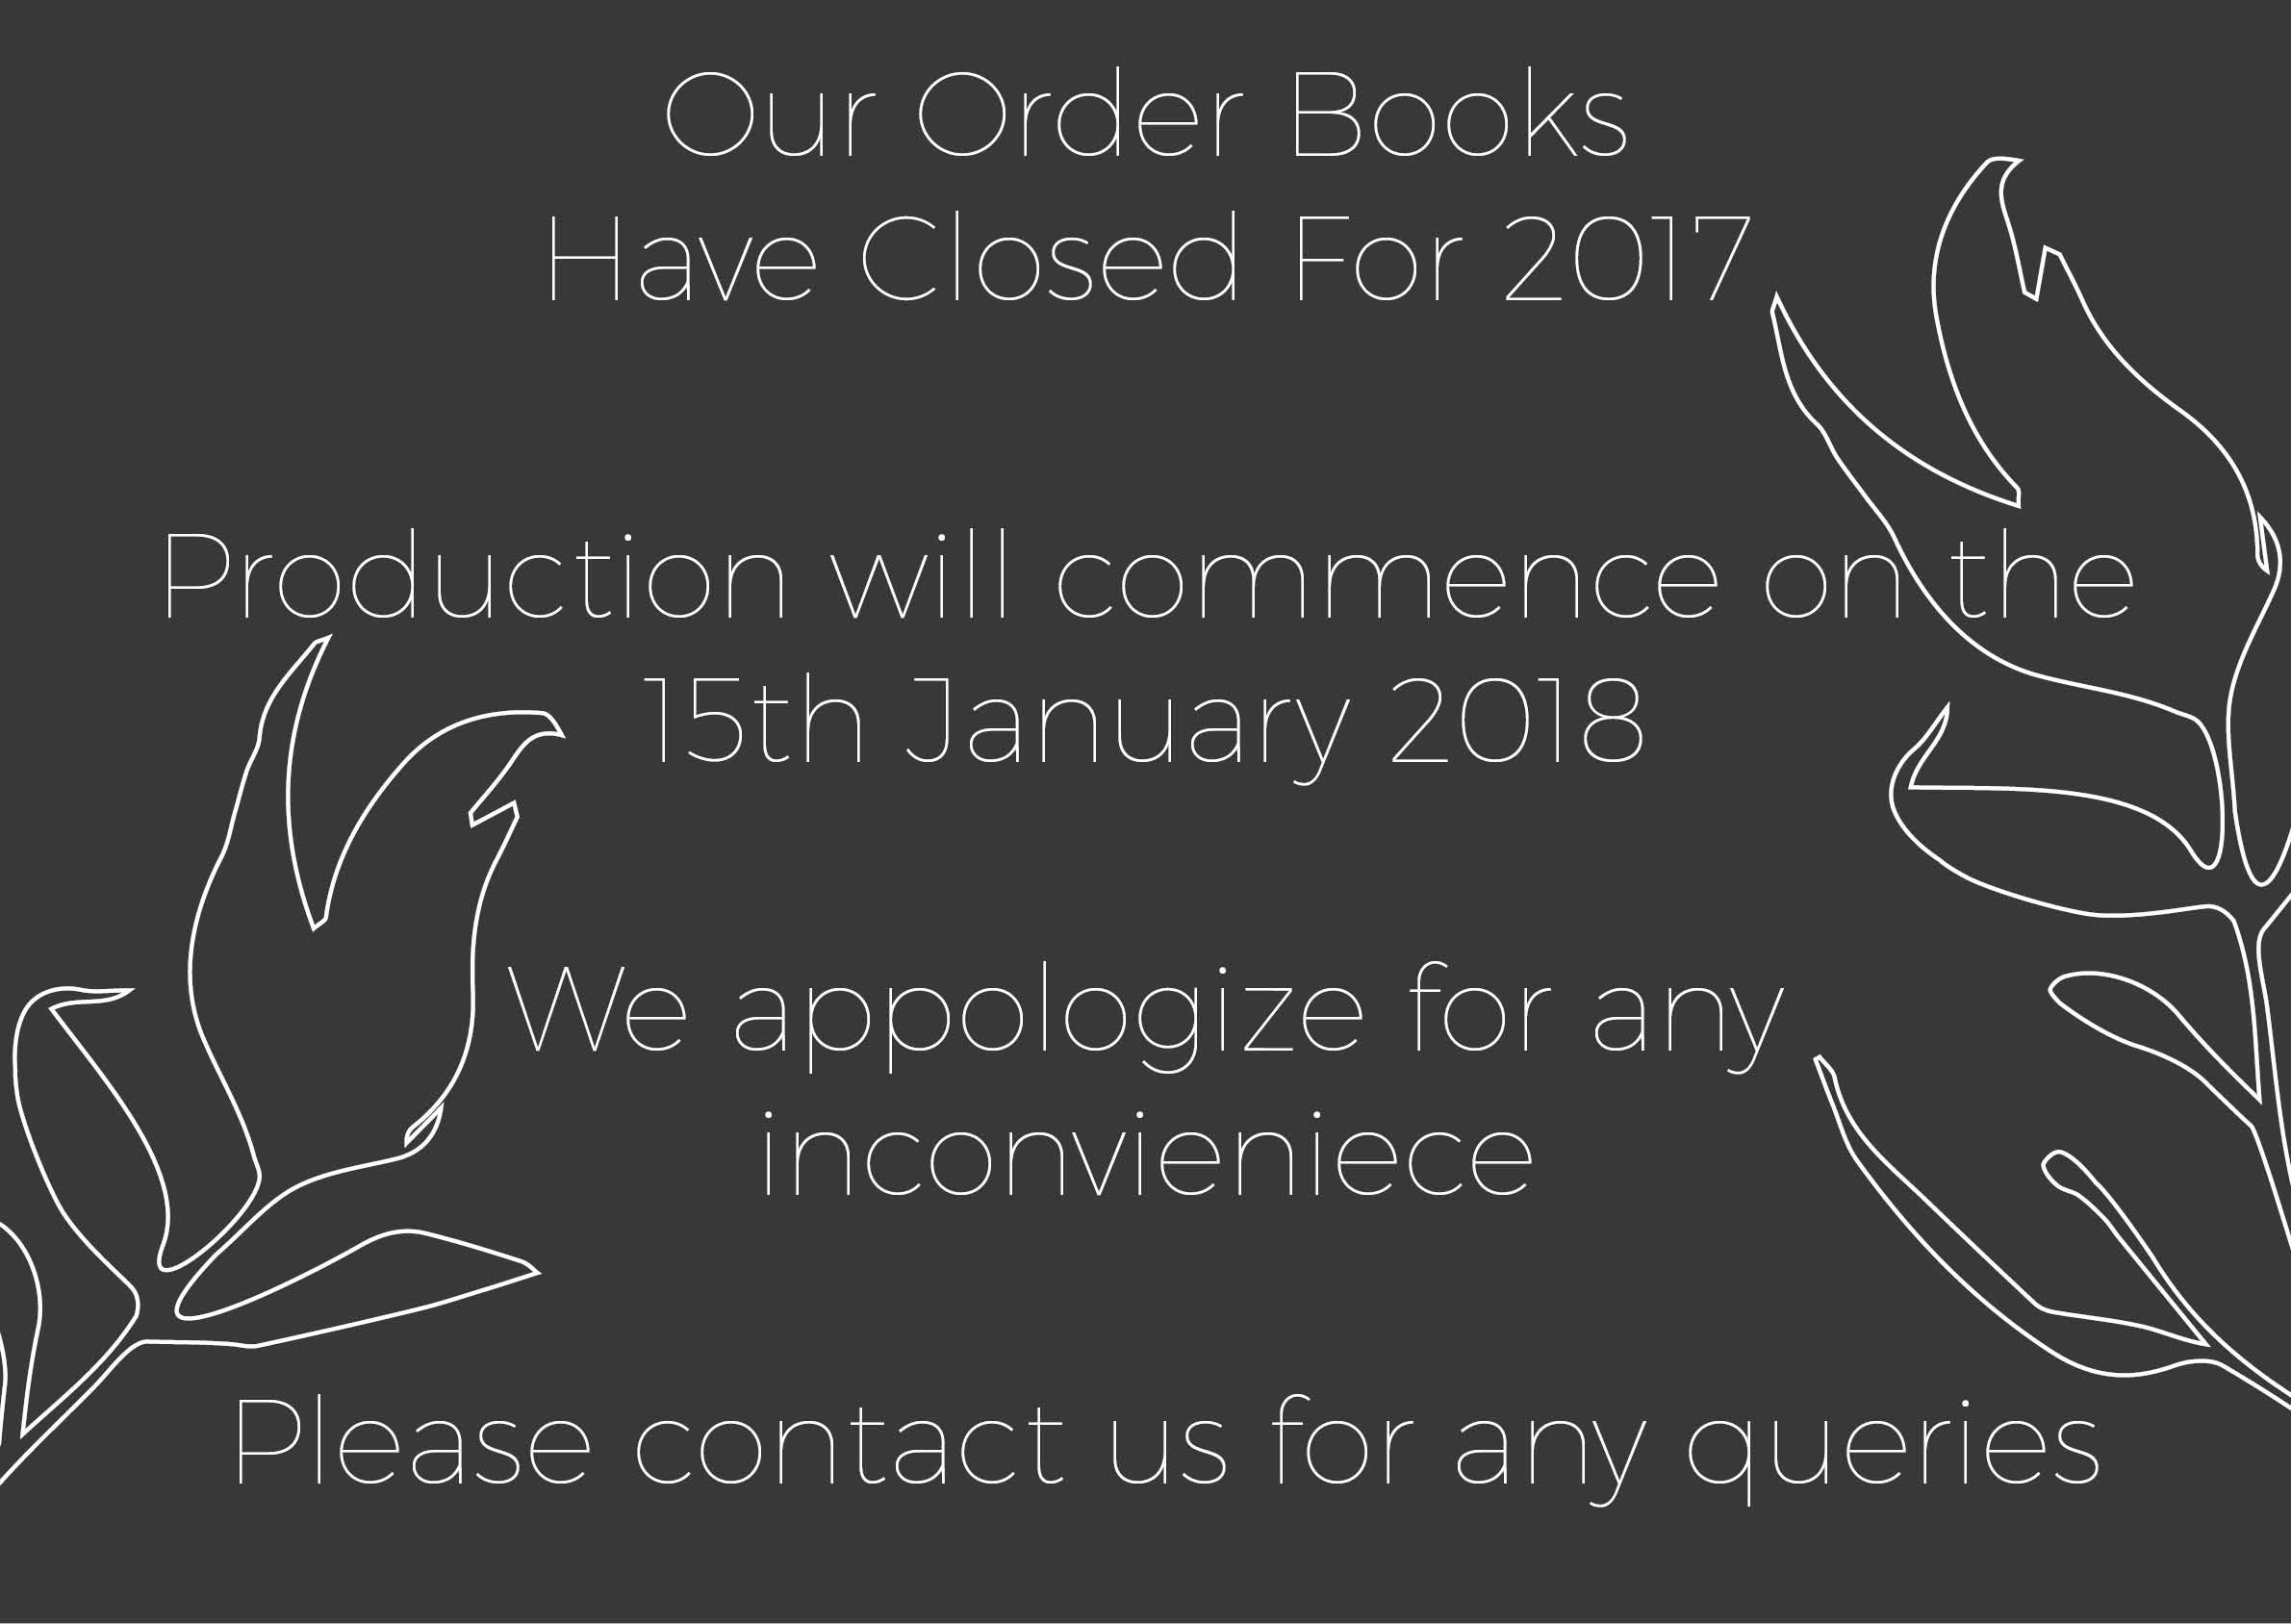 Order books closed 2017 3